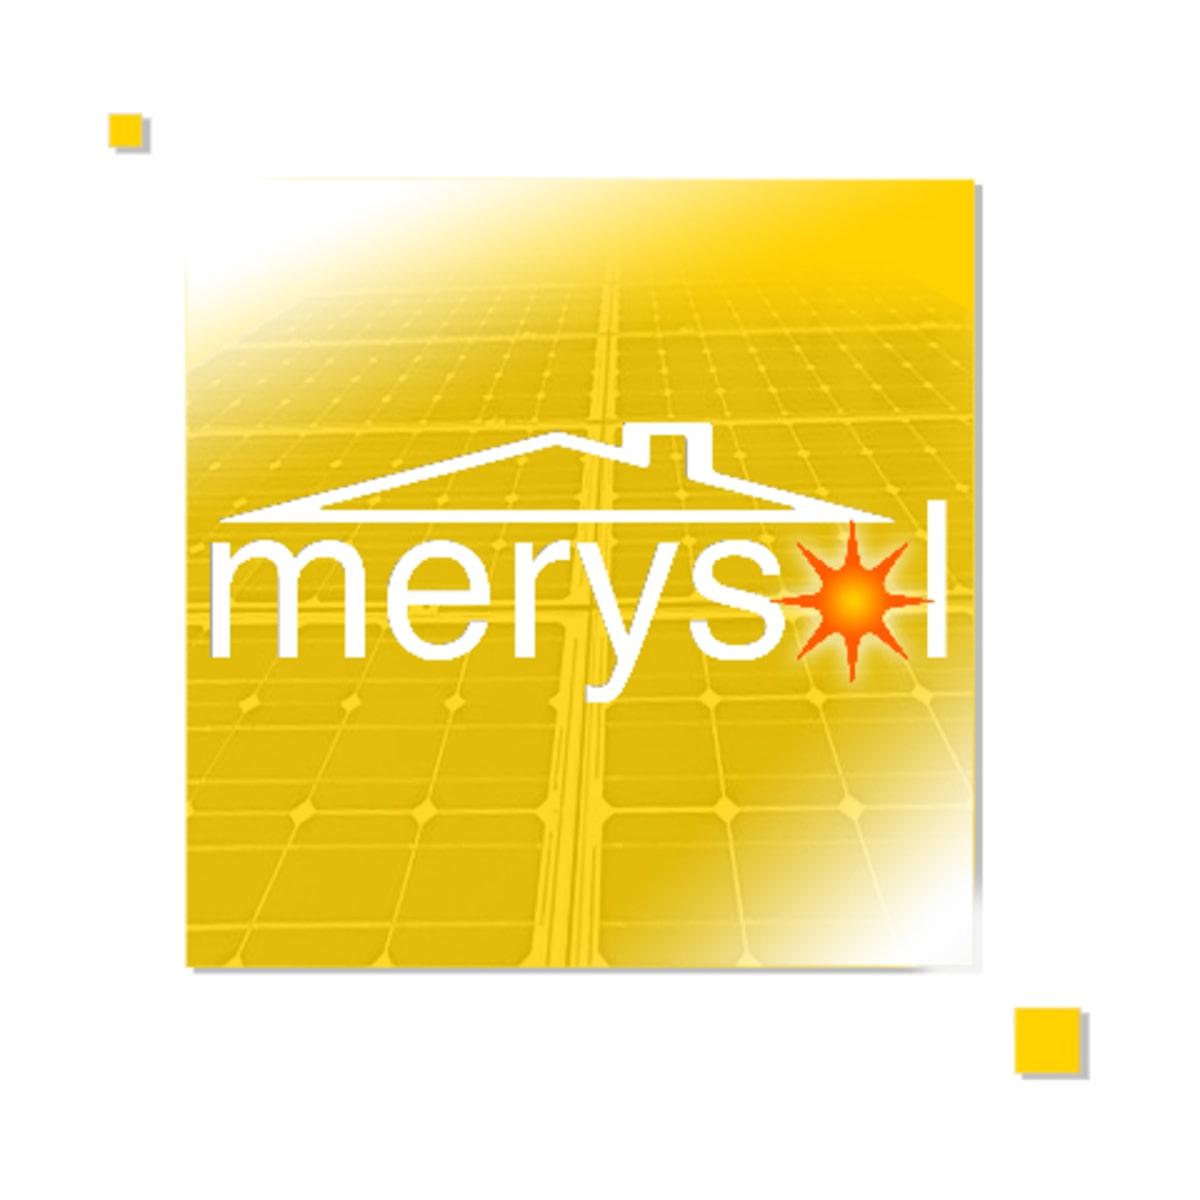 Merysol